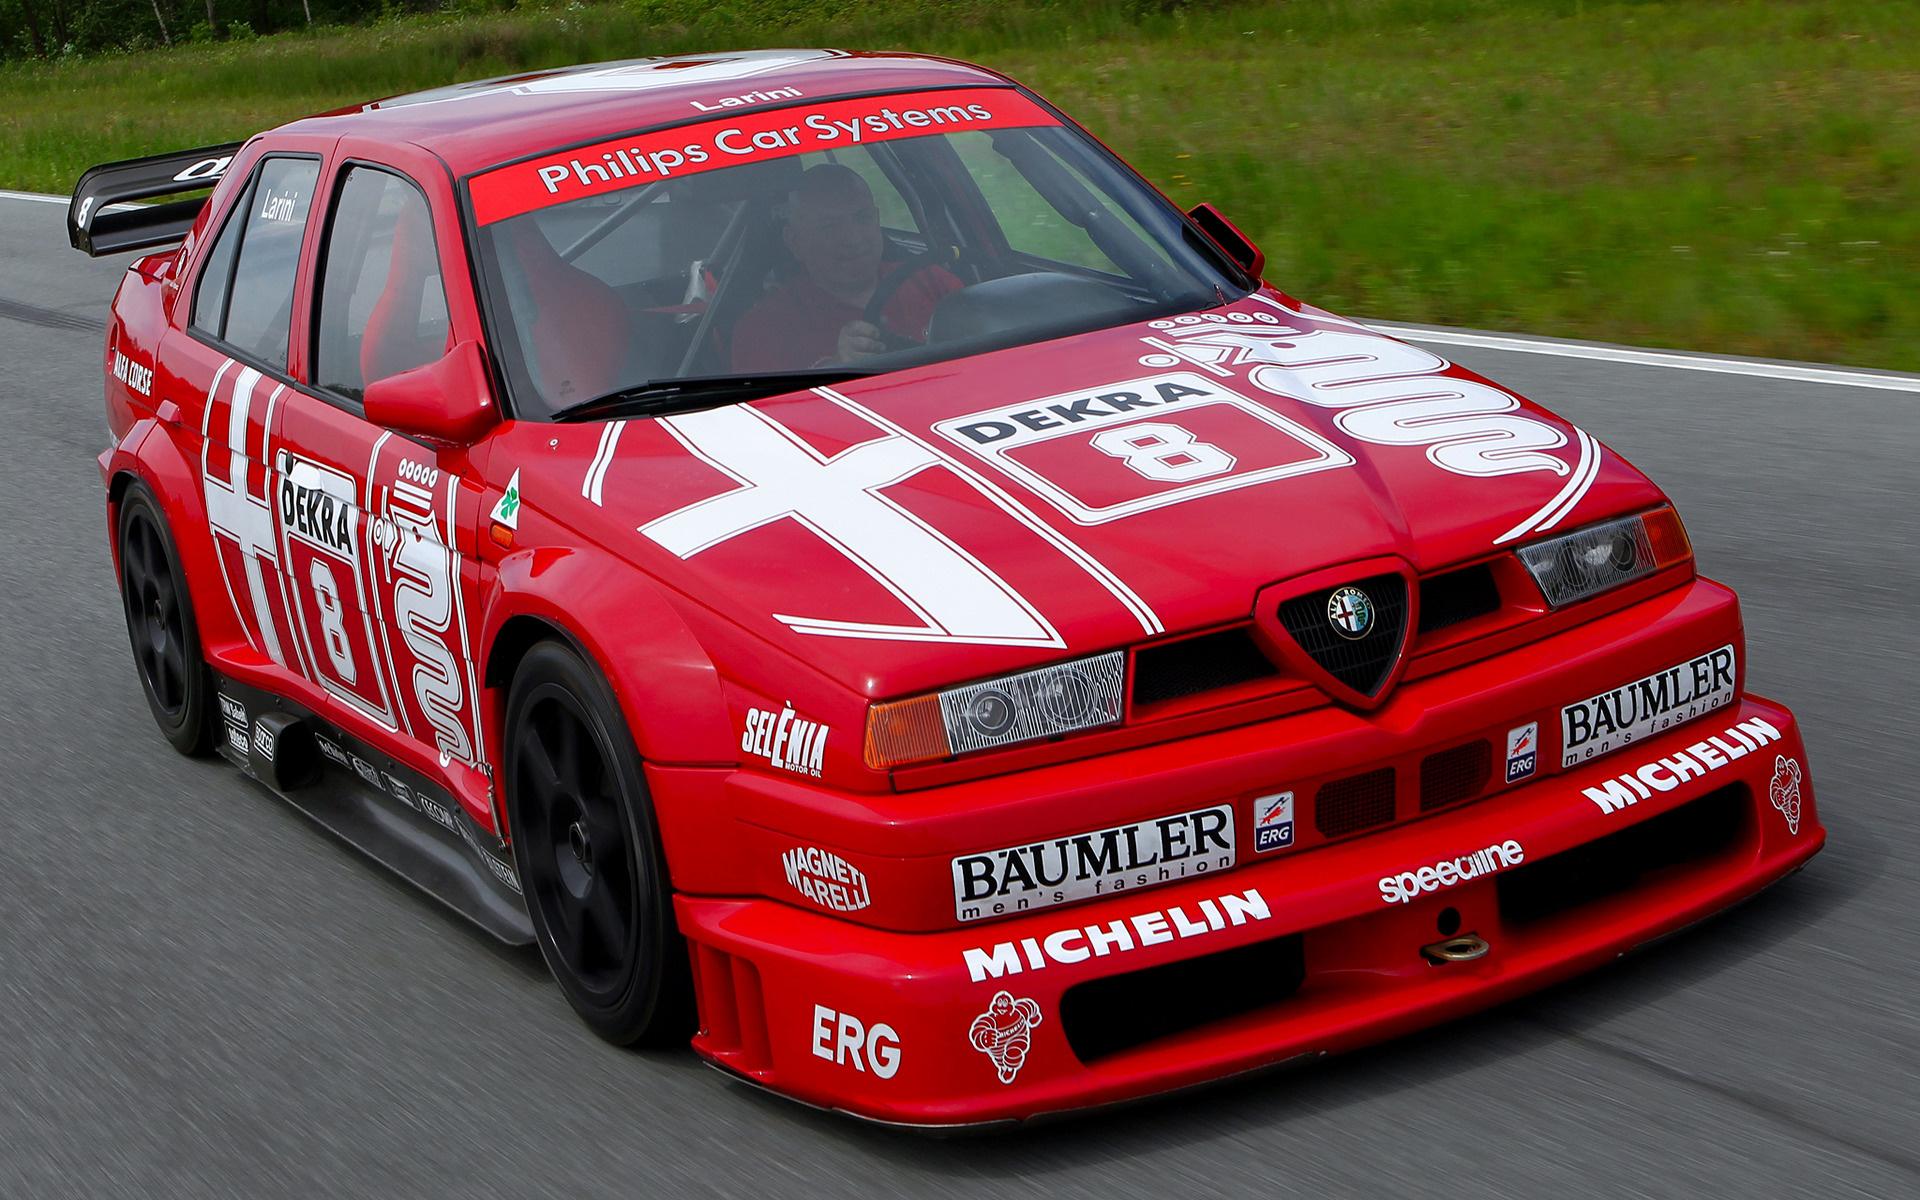 Alfa Romeo Ti Dtm Car Wallpaper on 1992 Dodge Ram